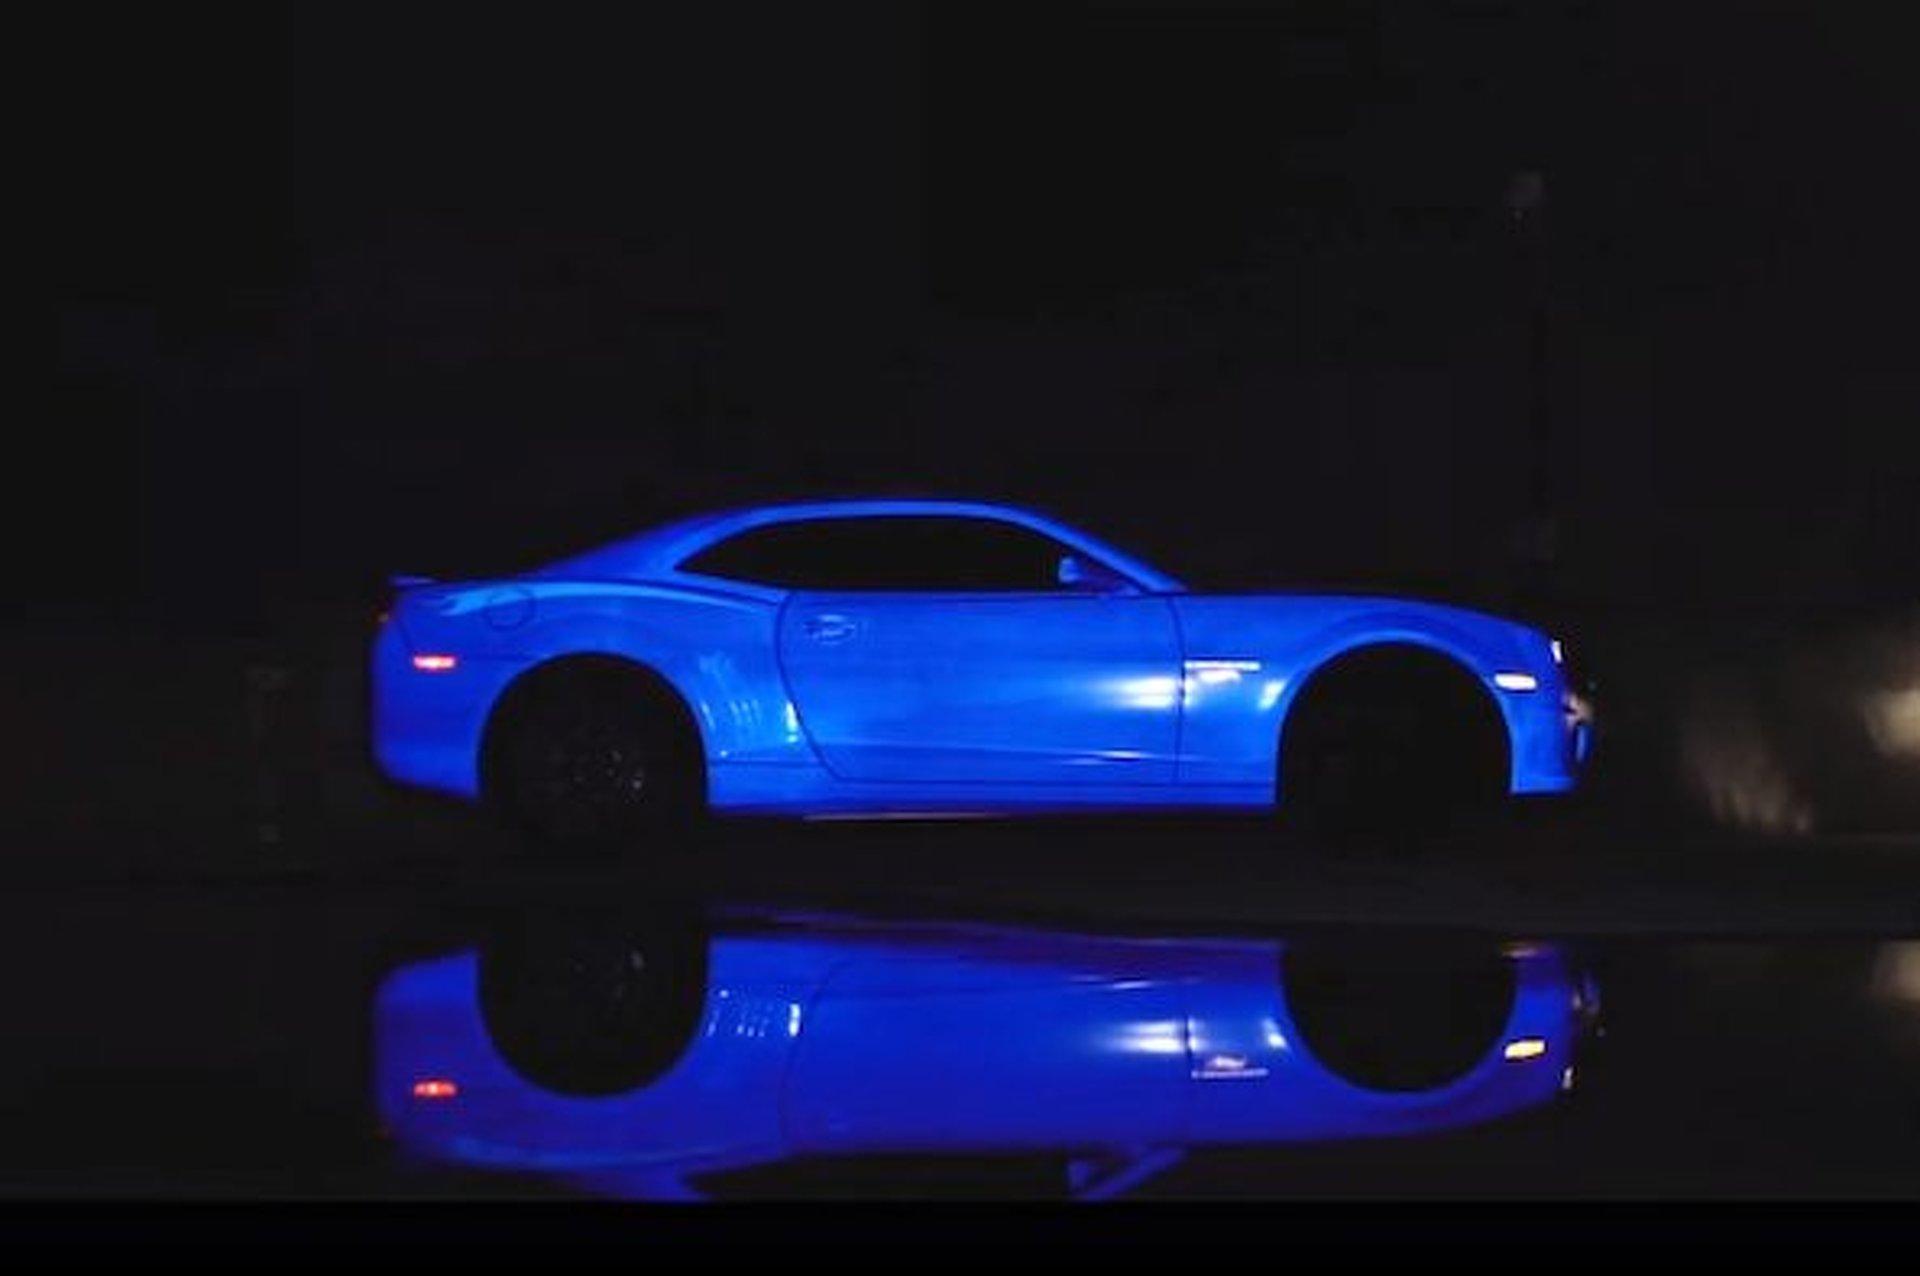 Video: Hot Wheels Shines With Glow-In-The-Dark Camaro